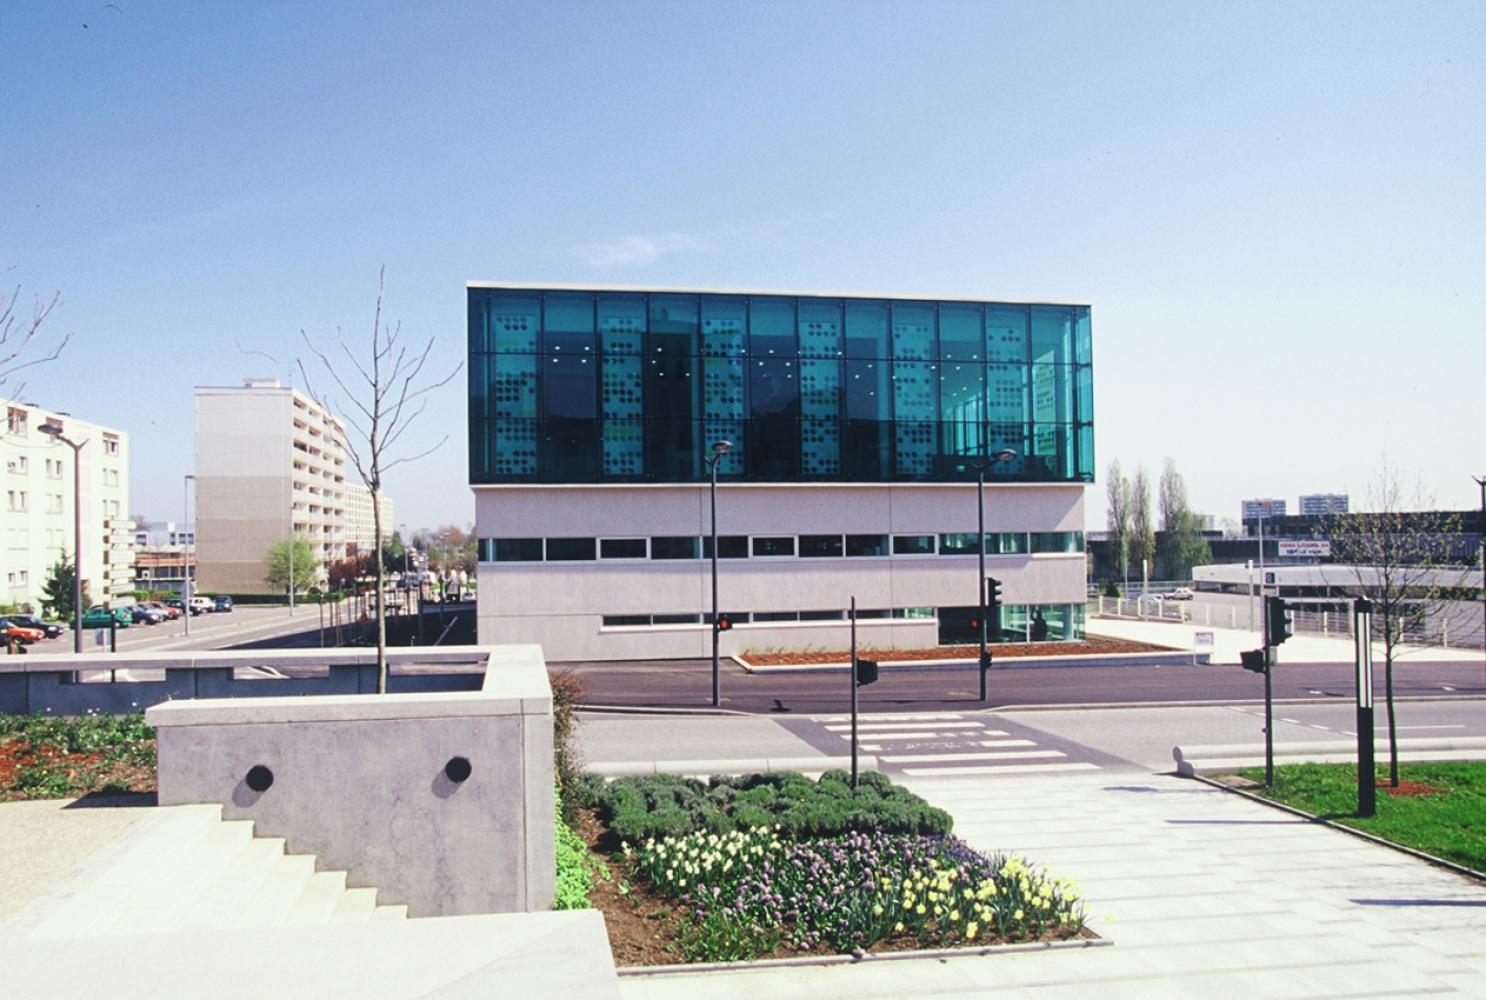 van--02 Pascale SEURIN Architecte - Pascale SEURIN Architecte